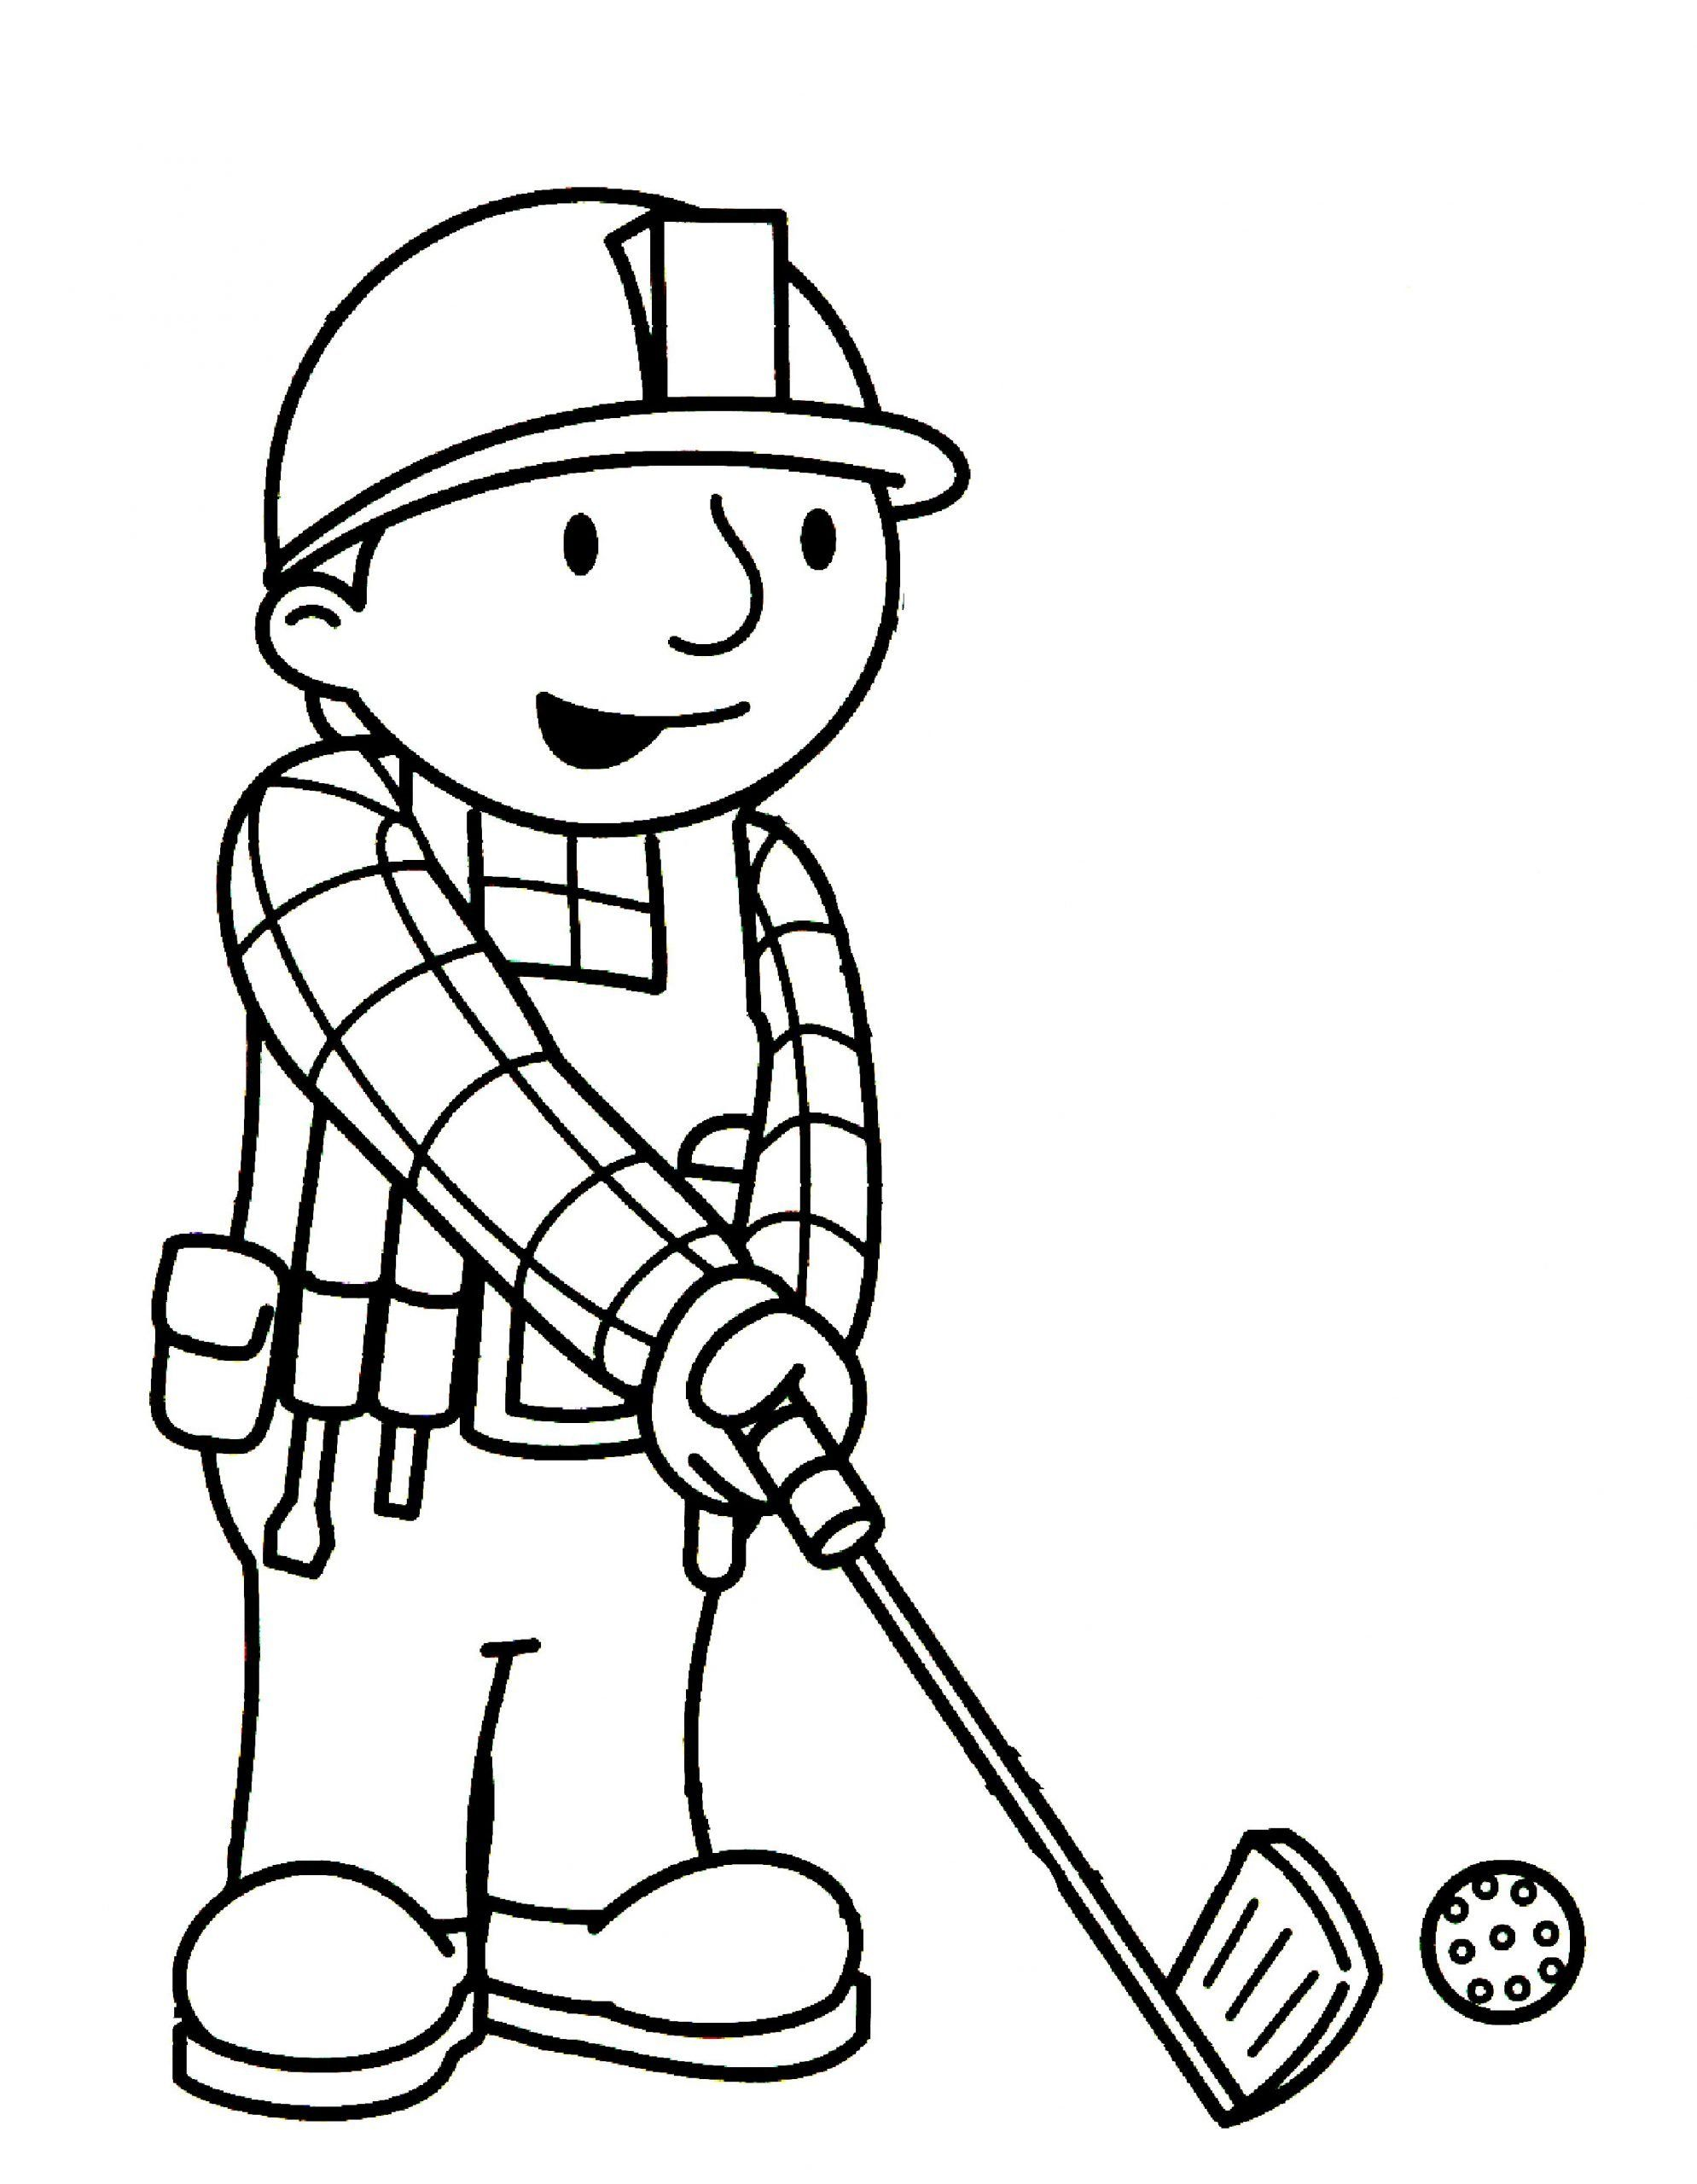 Bob The Builder Coloring Sheets Bob The Builder Coloring